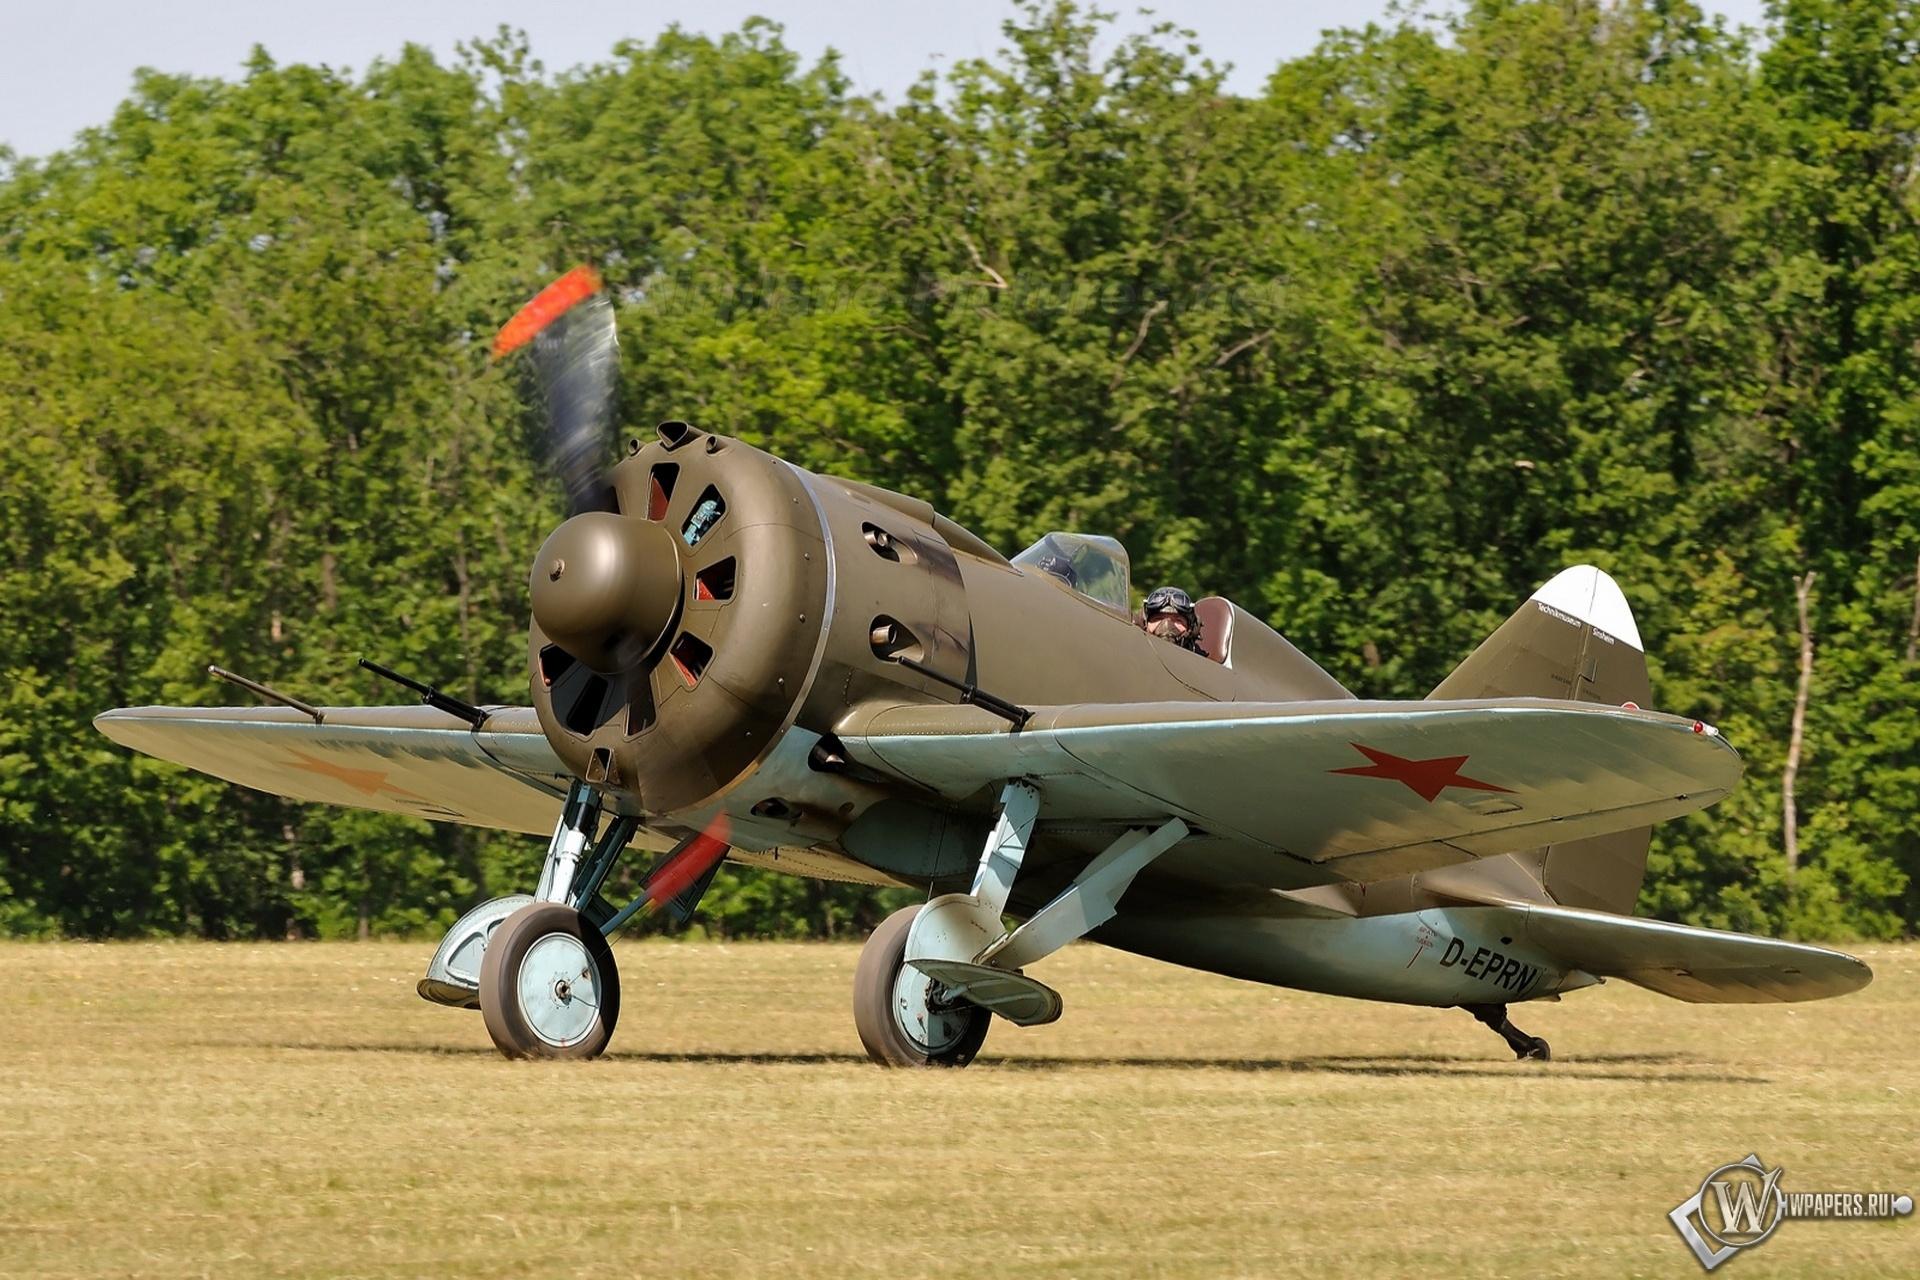 Polikarpov I-16 1920x1280